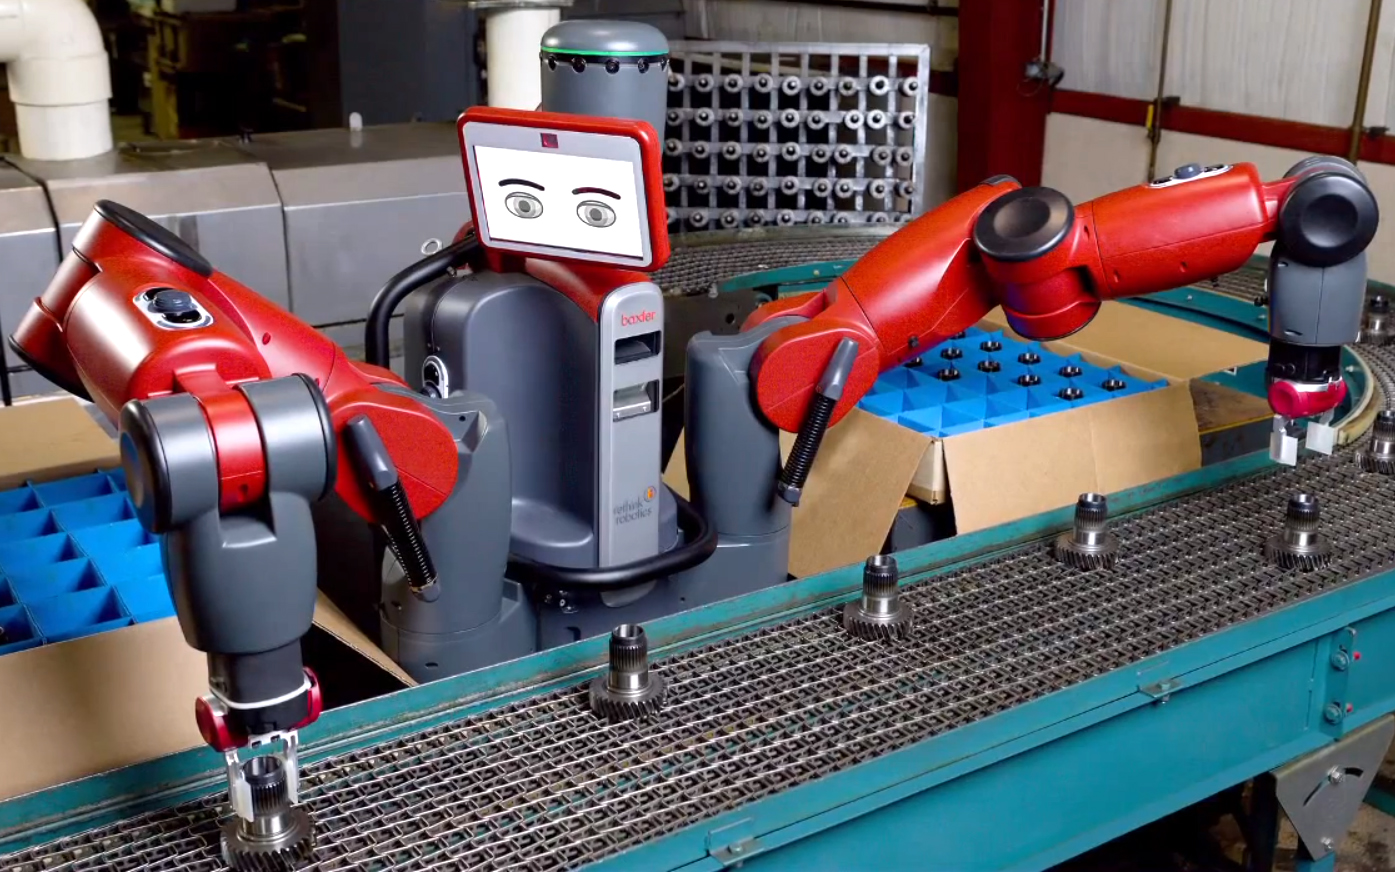 baxter collaborative robots